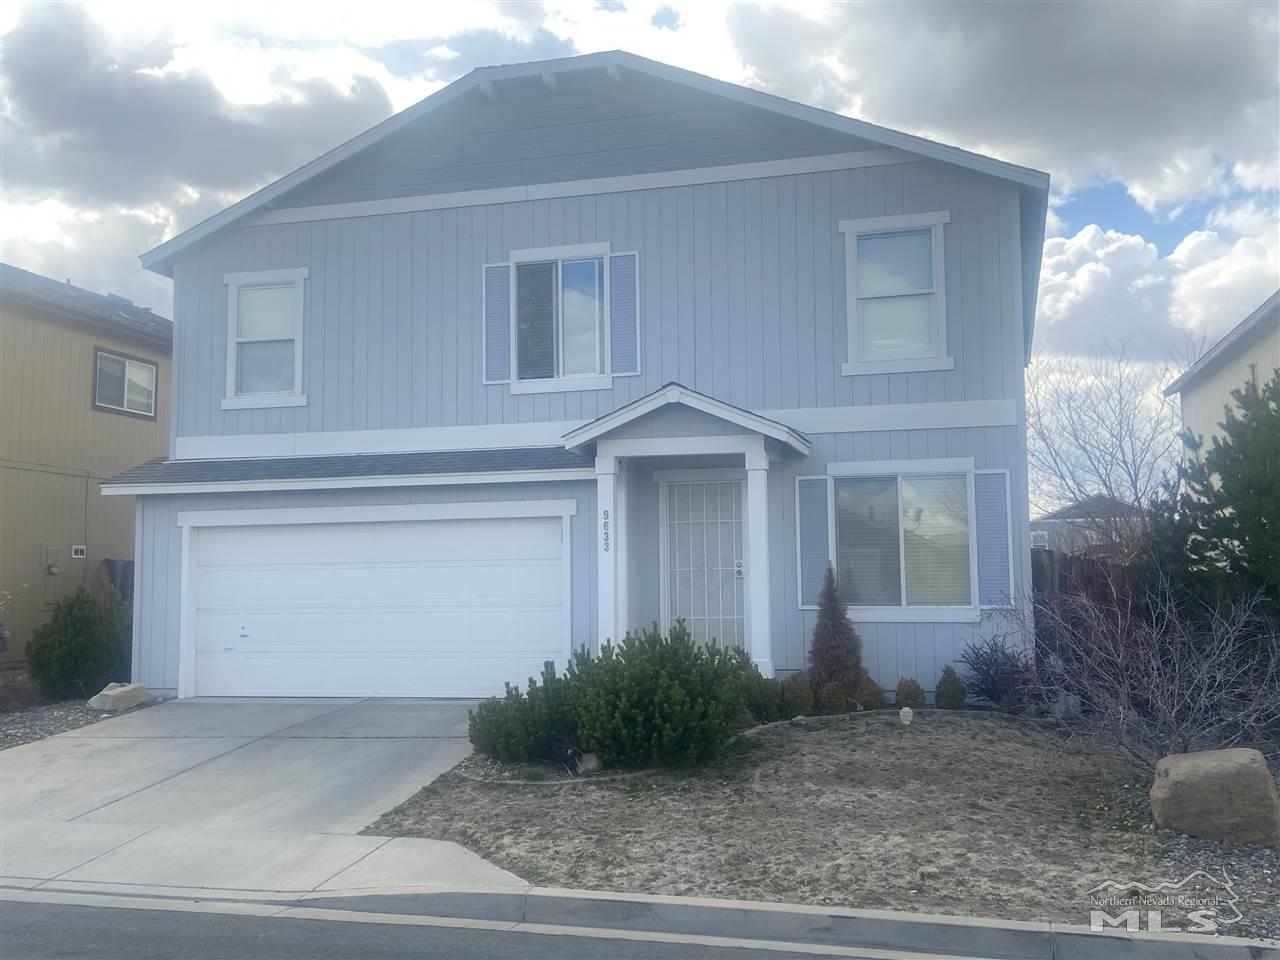 Image for 9633 Canyon Meadows Drive, Reno, NV 89506